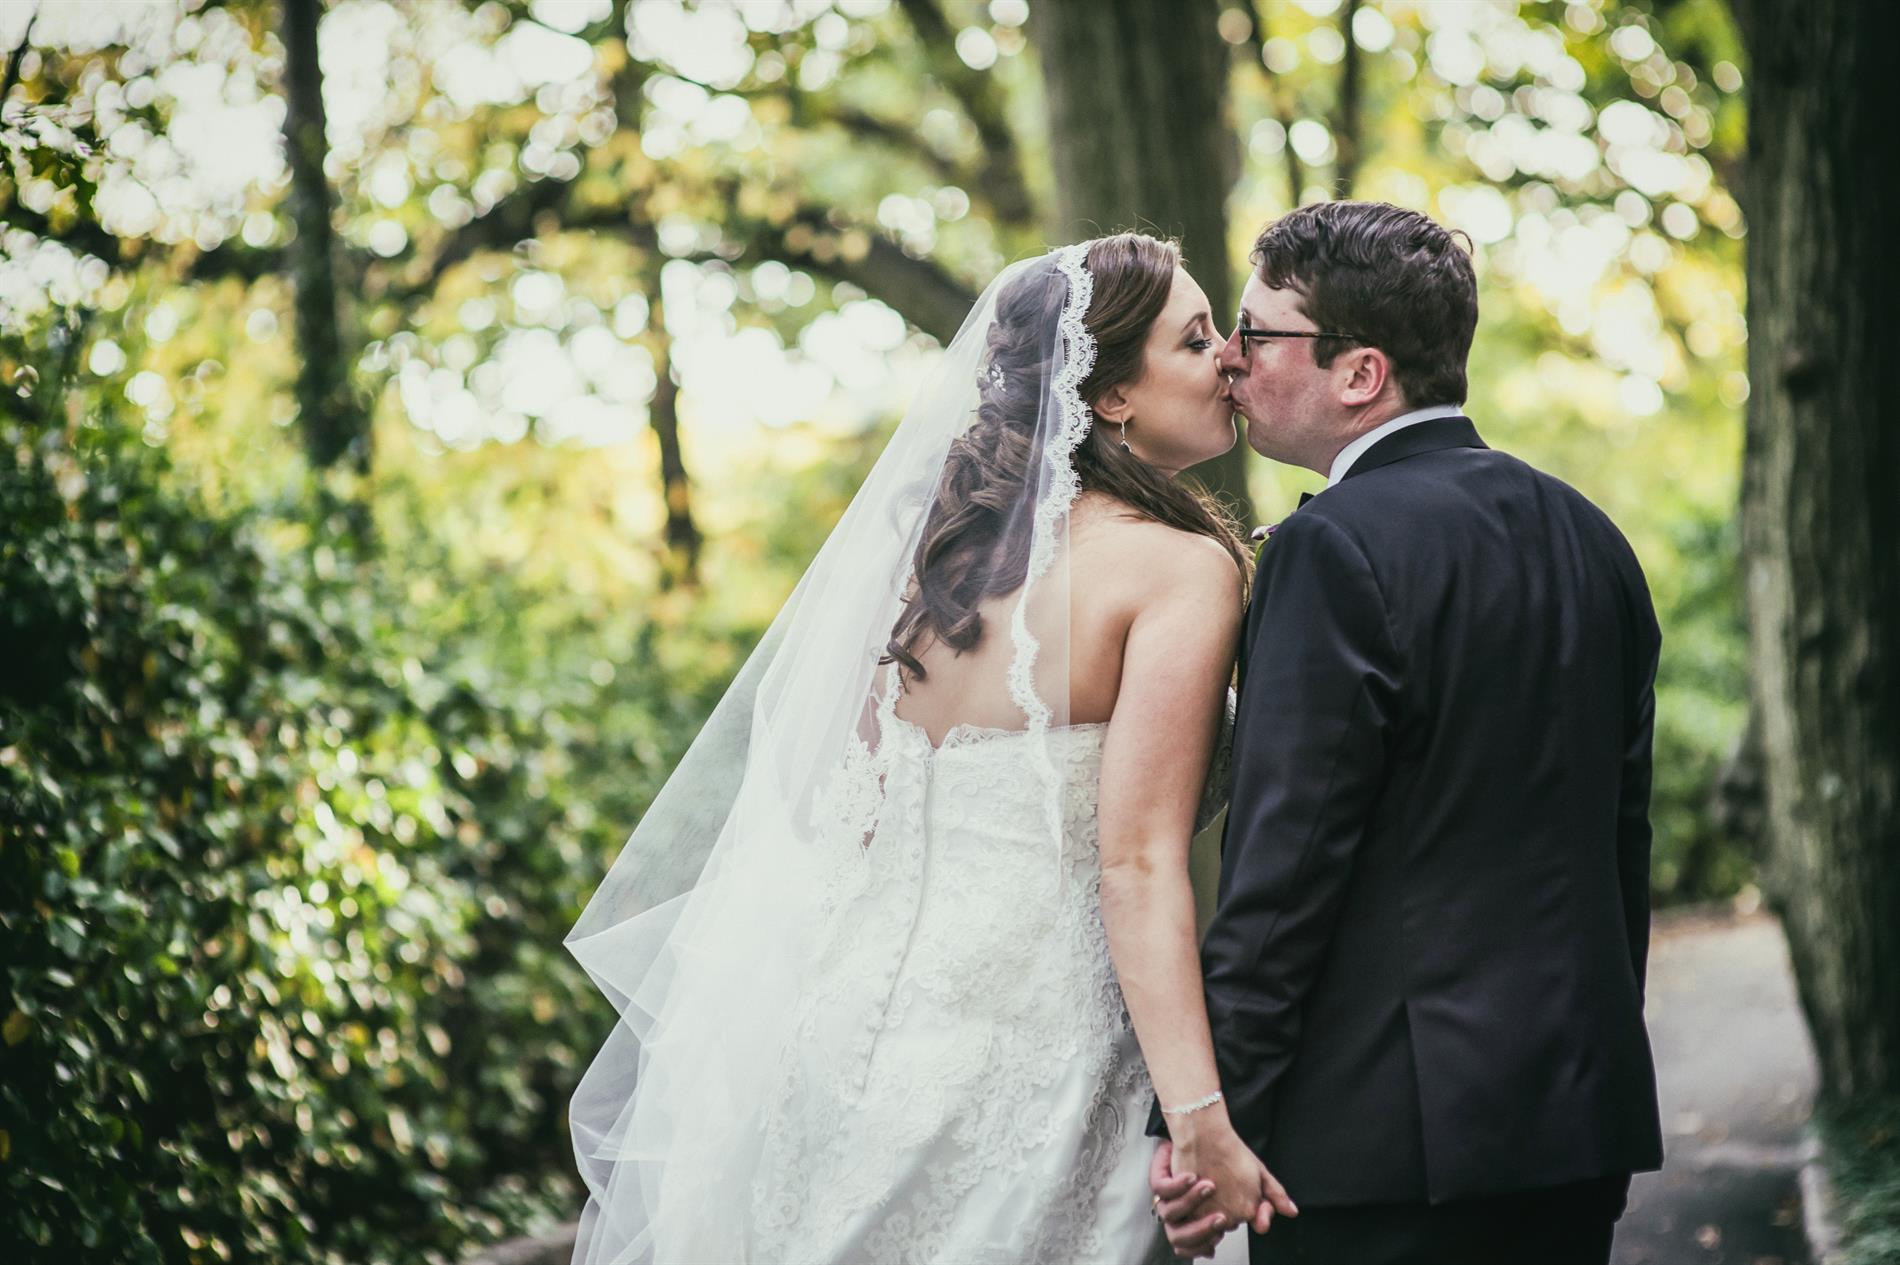 Brian & Alison Wedding Photos